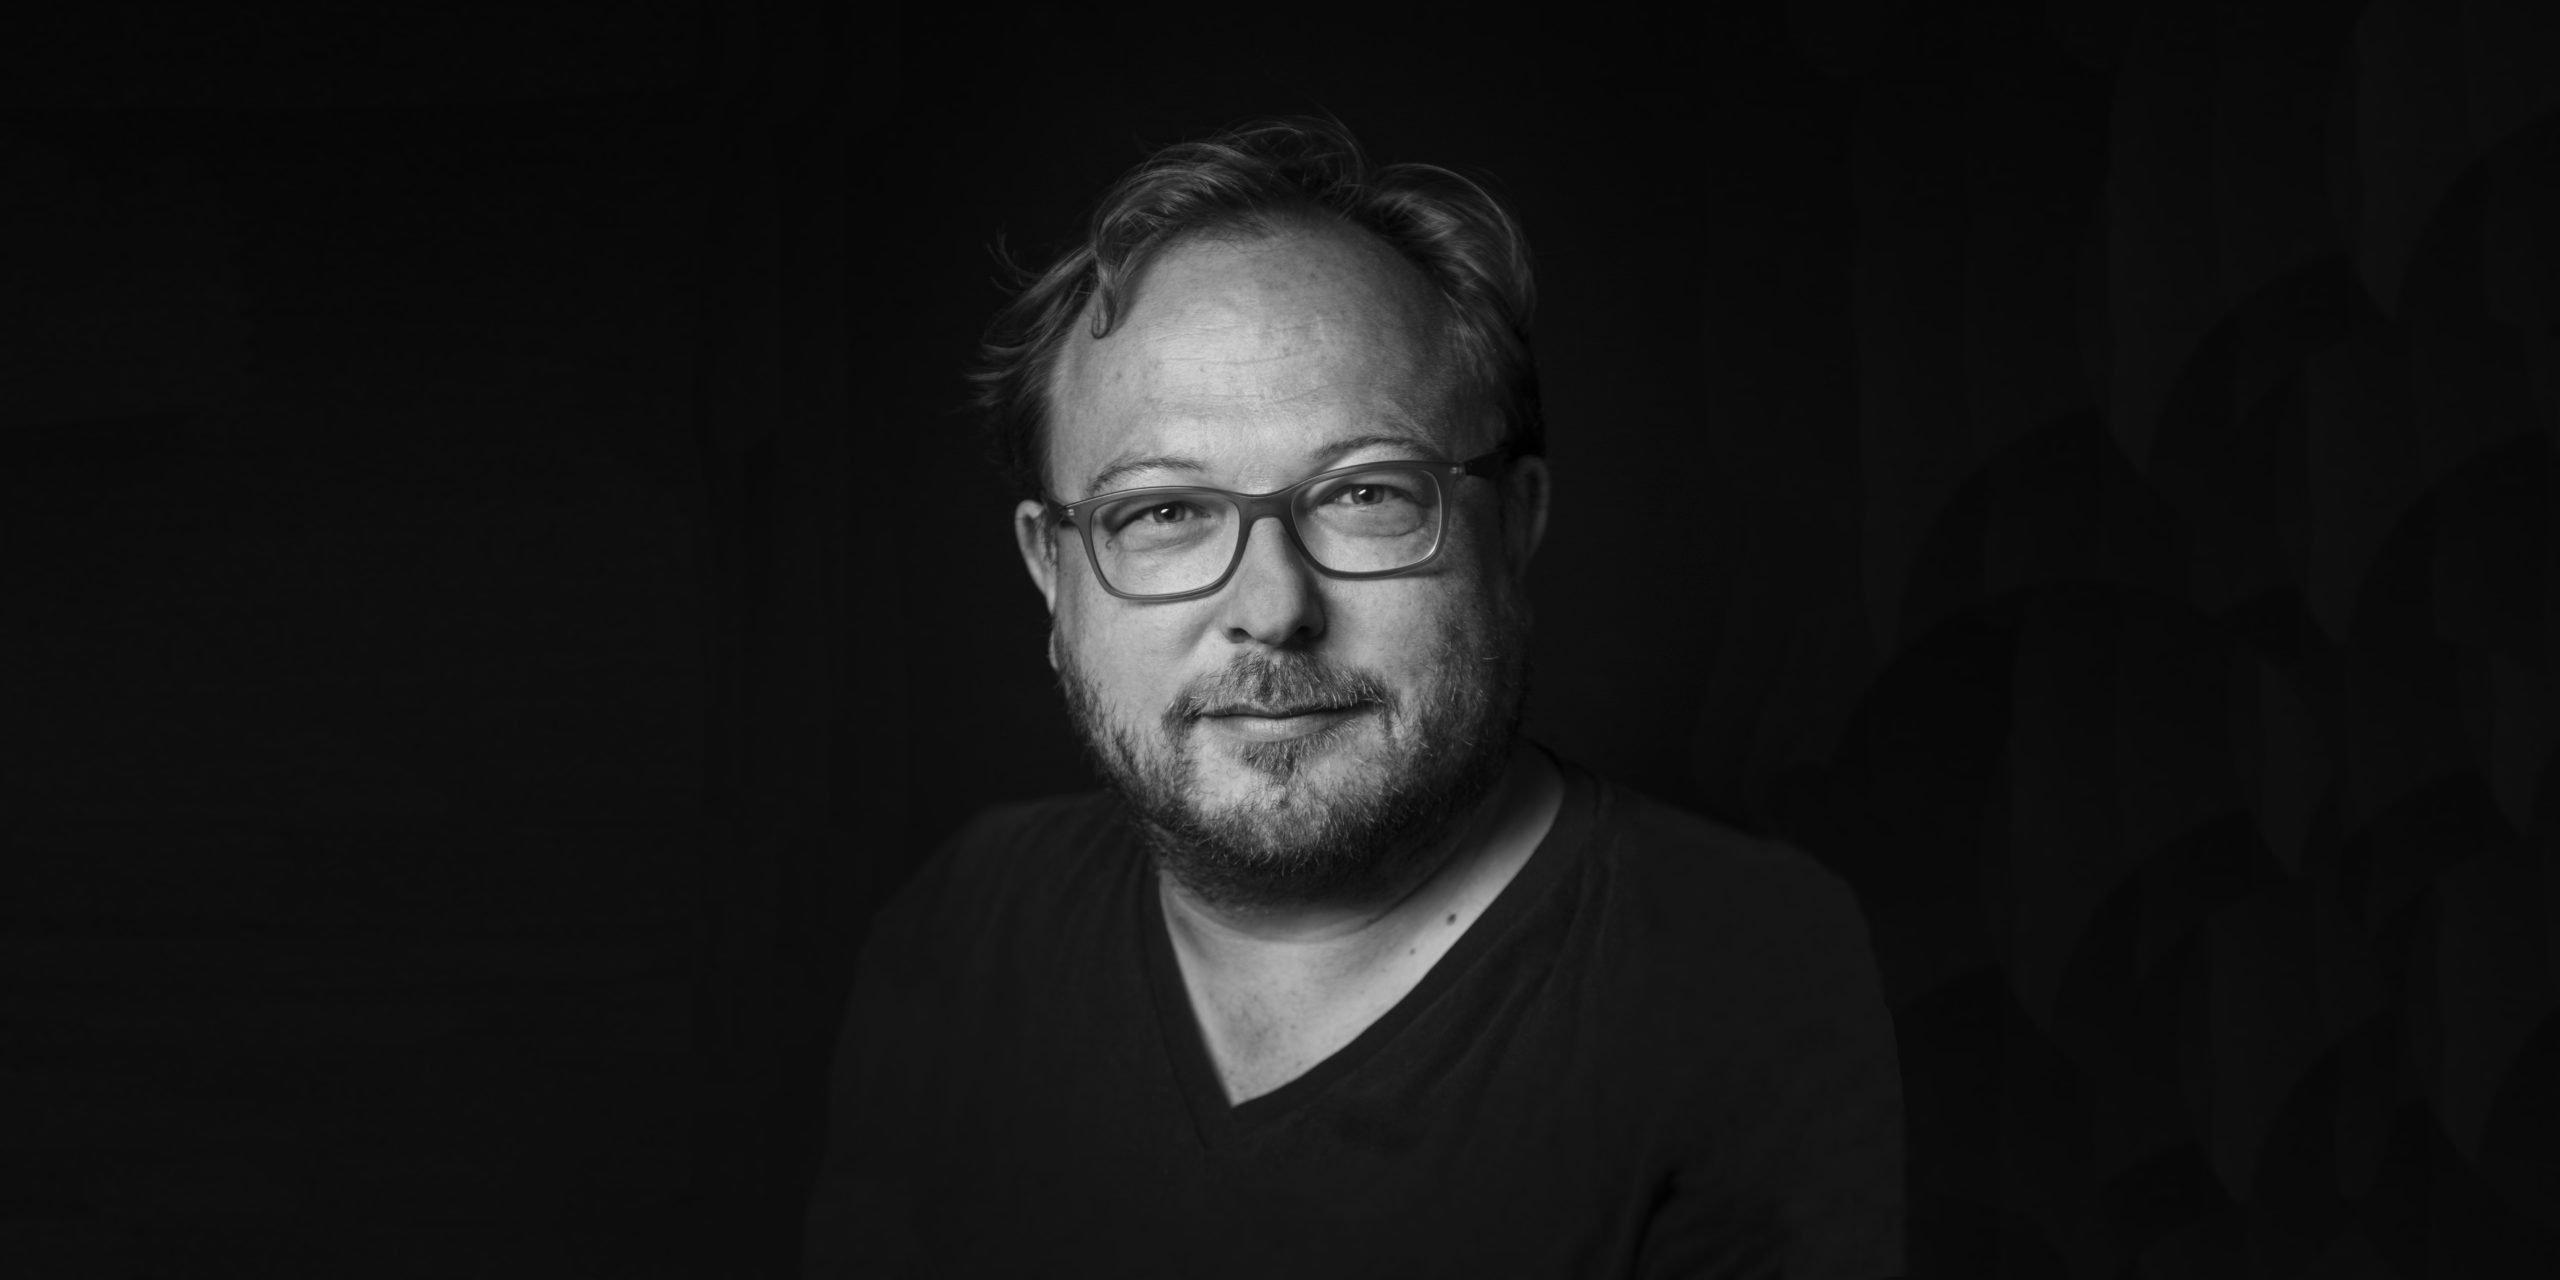 3 books by heinrich völkel